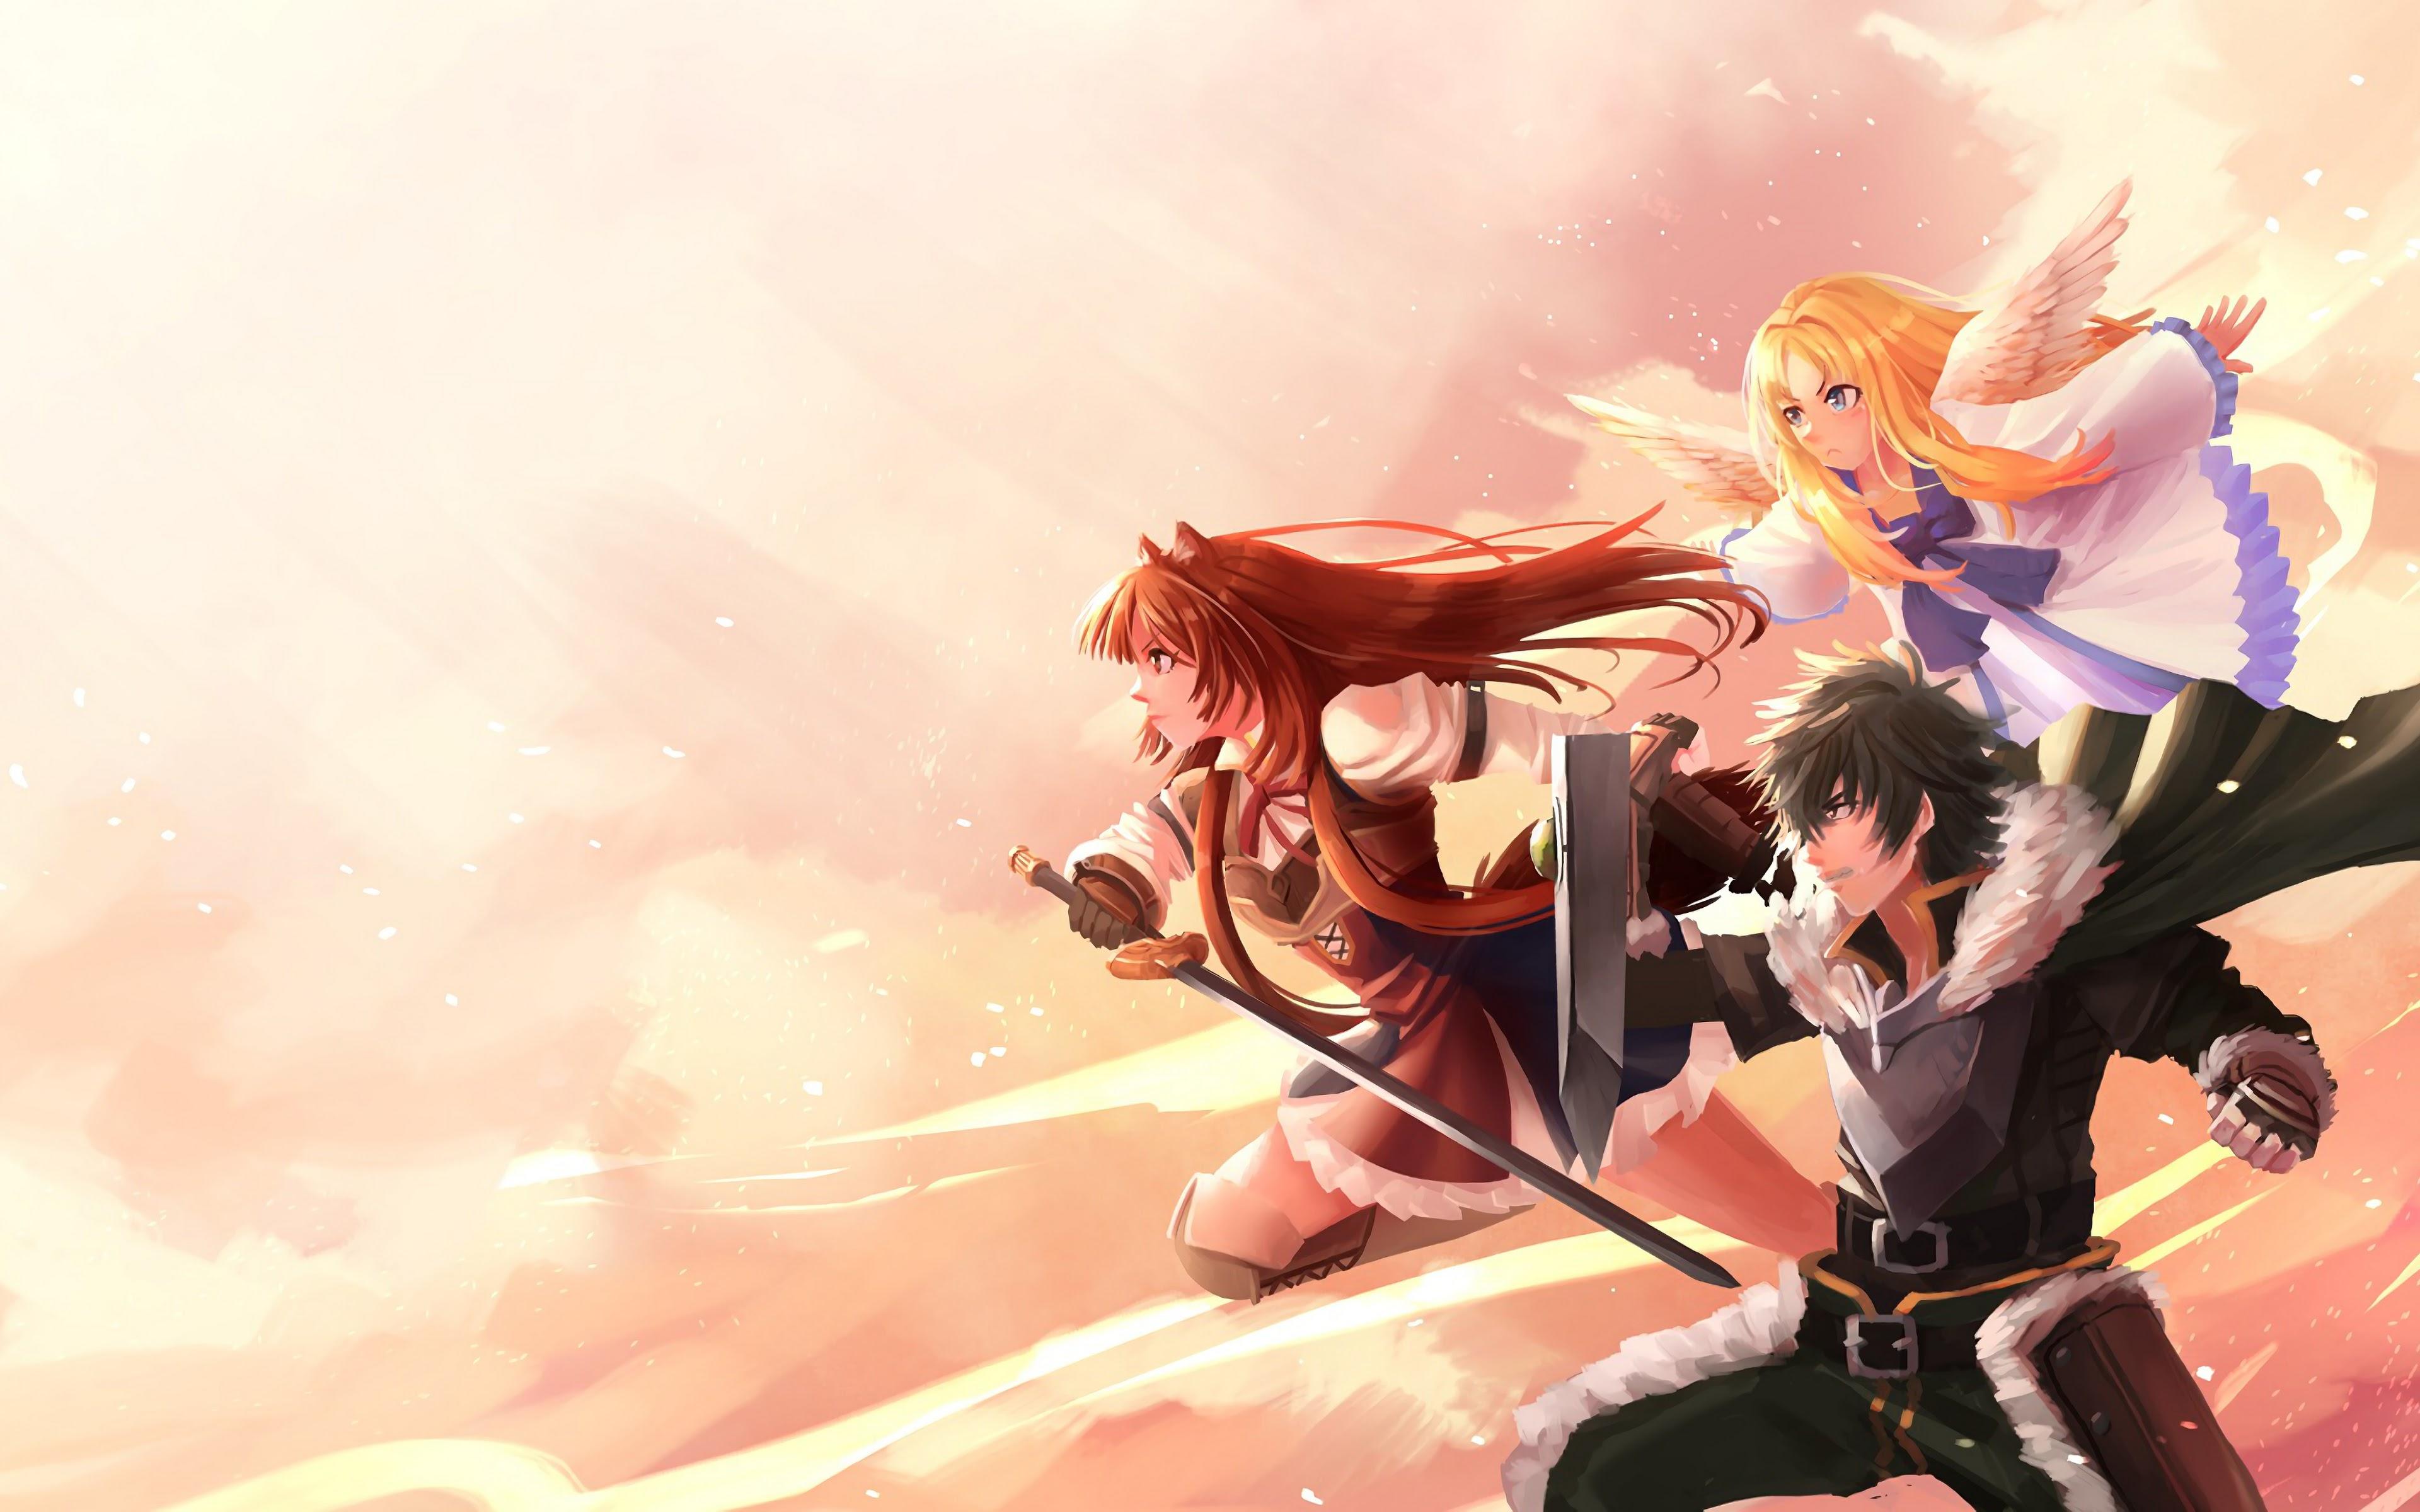 Naofumi Raphtalia Filo The Rising Of The Shield Hero 4k Wallpaper 26